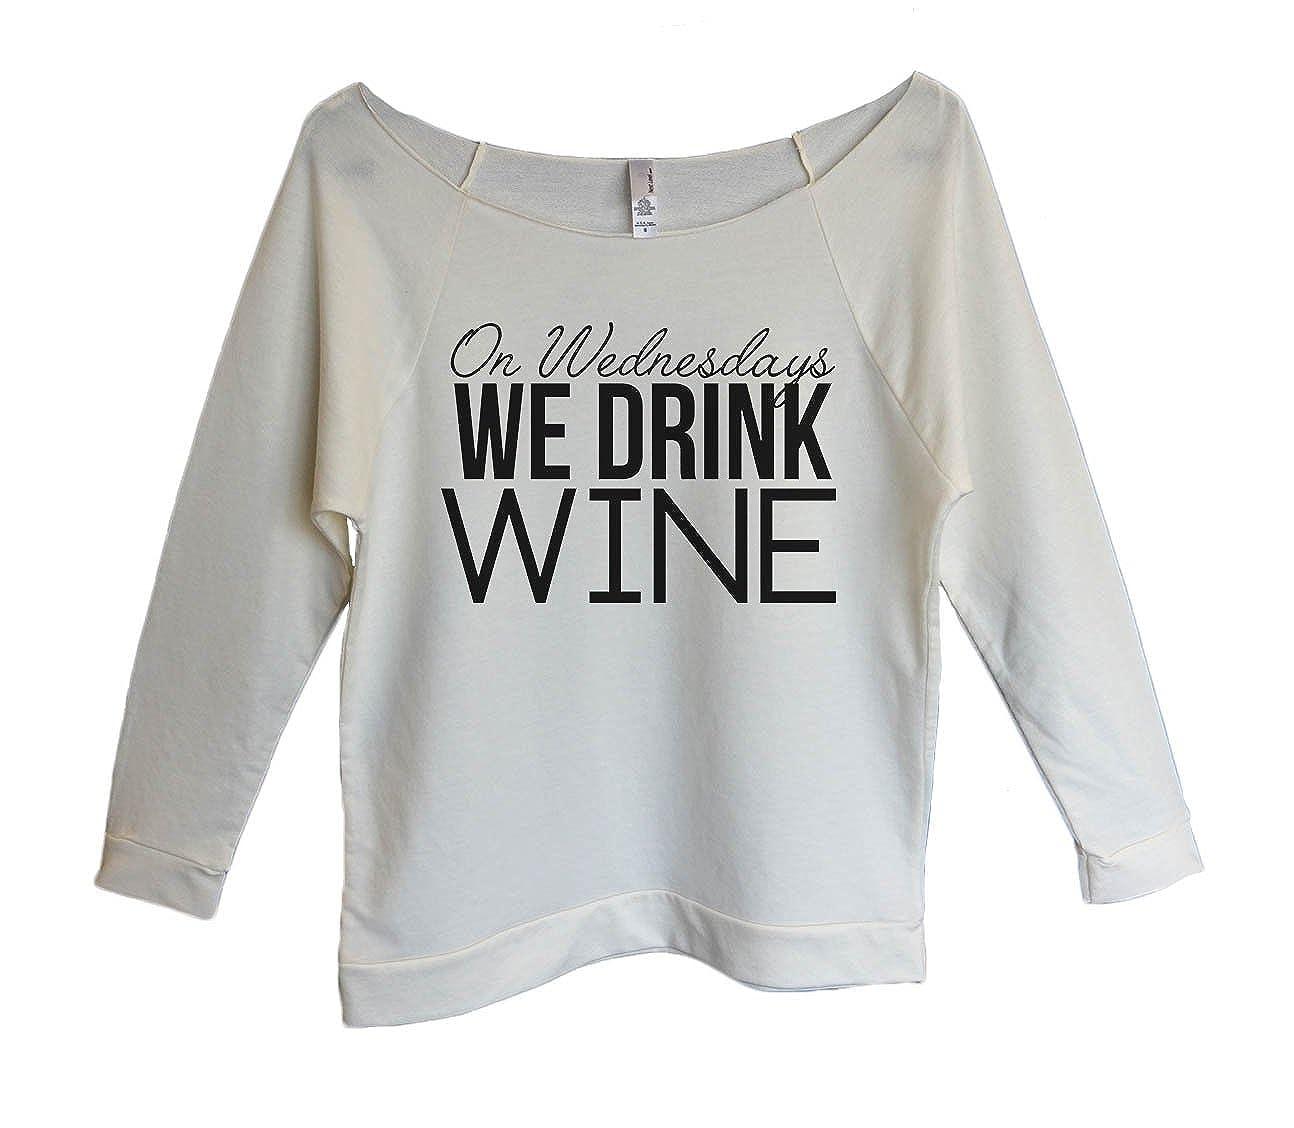 Womens 3/4 Sleeve Raglan On Wednesdays We Drink Wine Sweater Gift- Funny Threadz